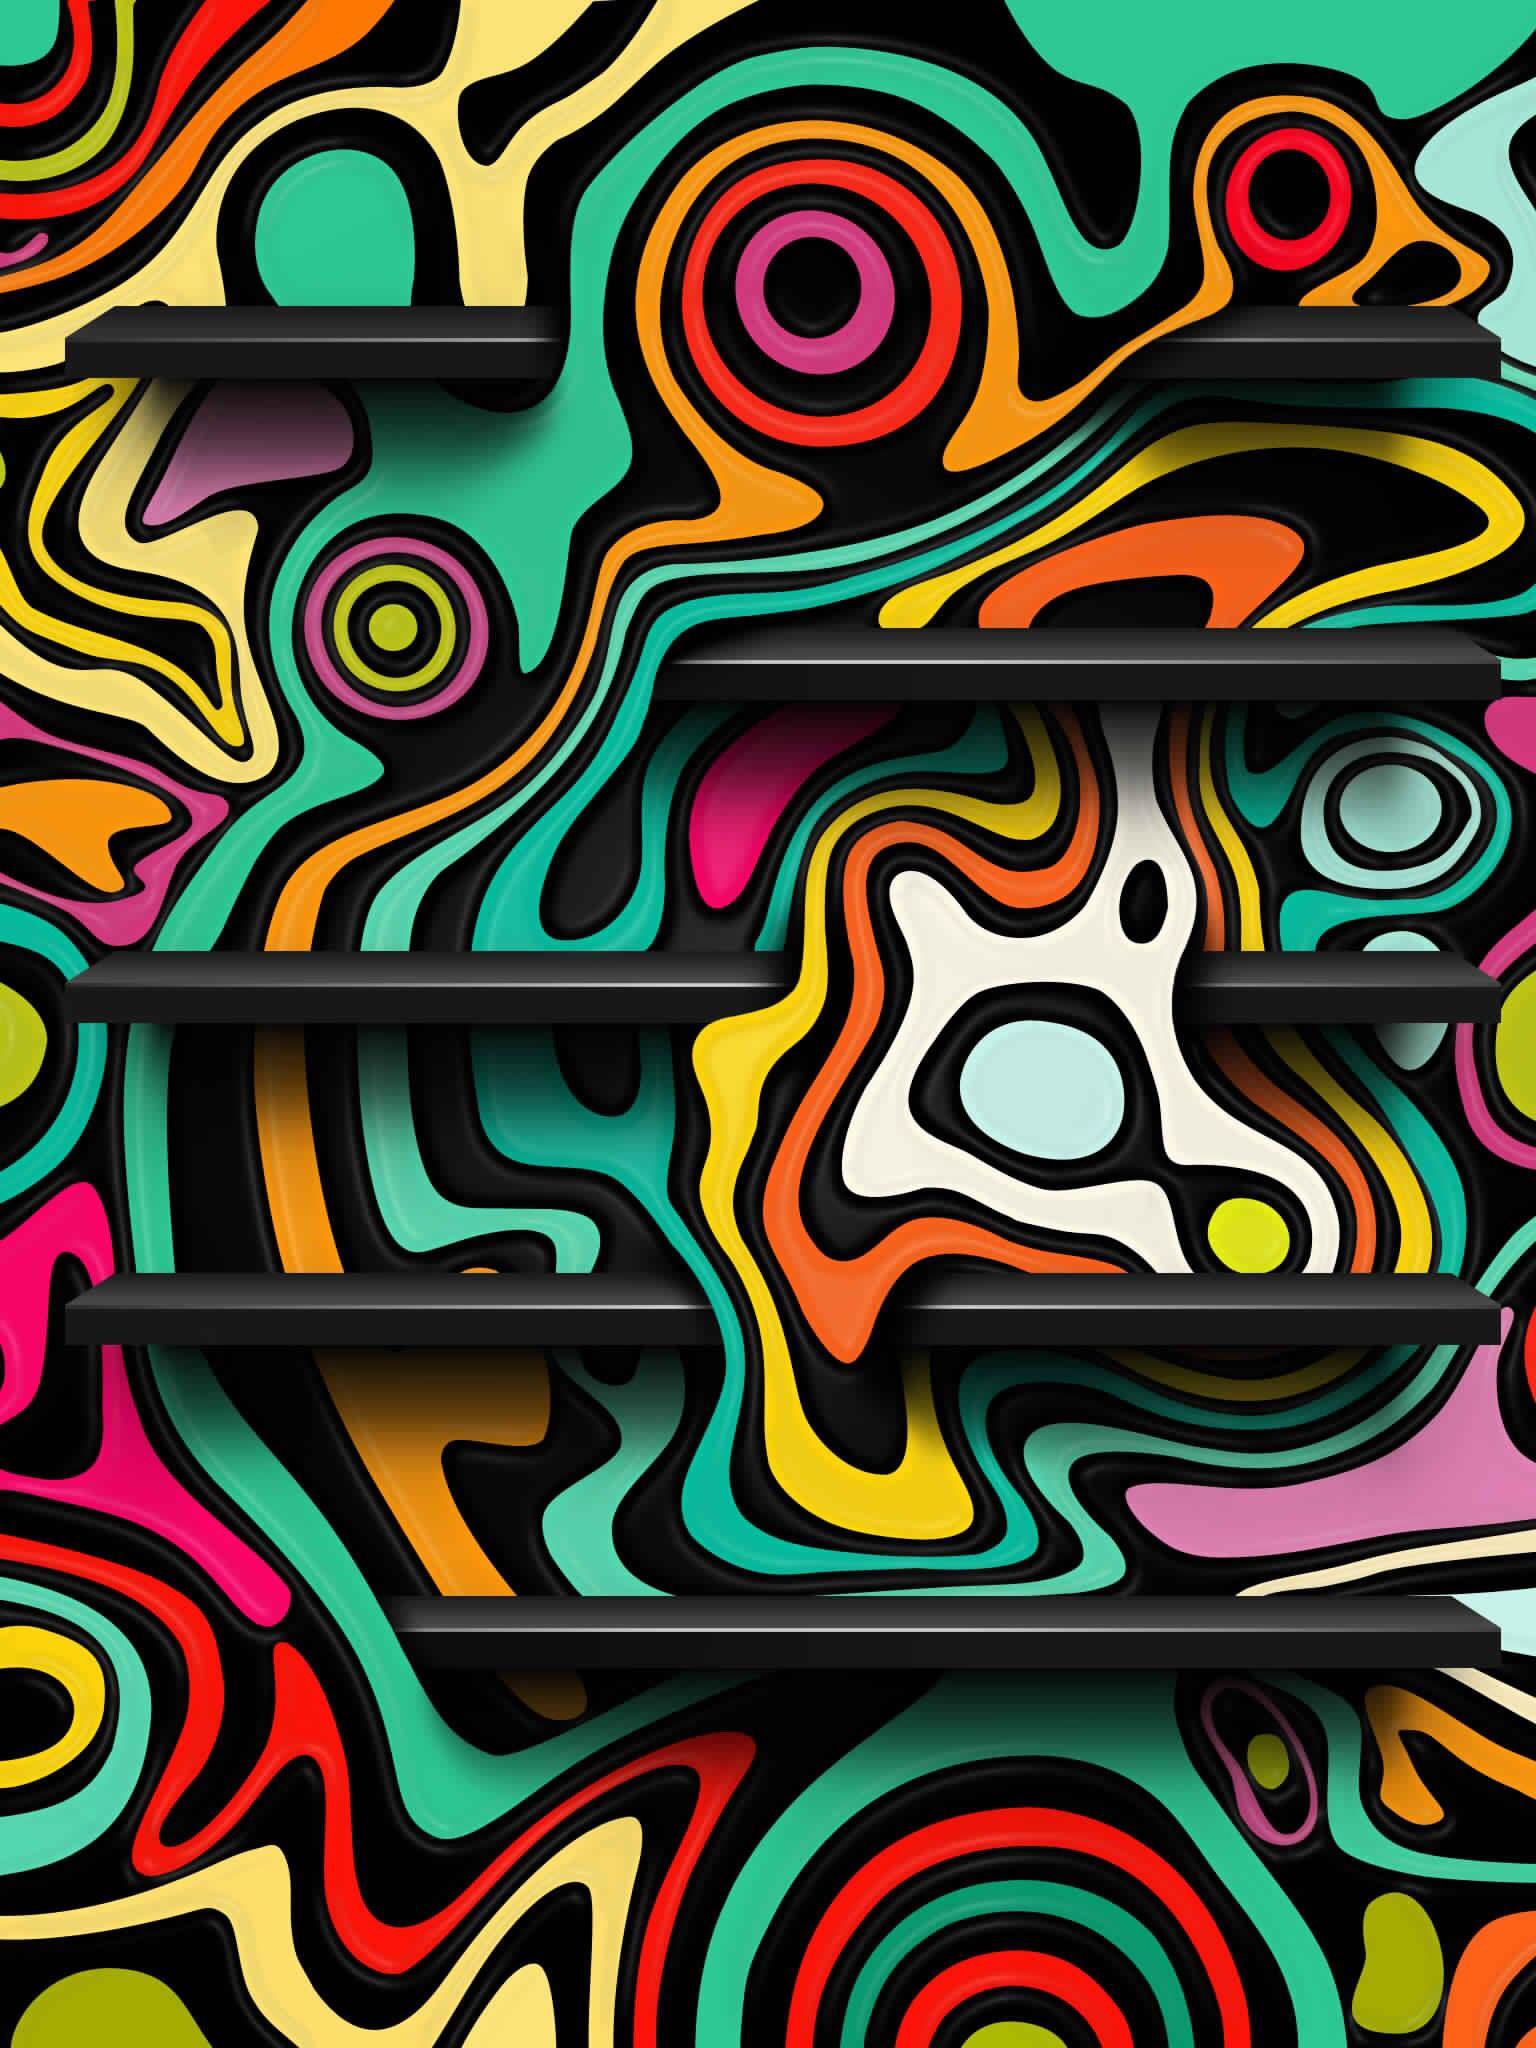 Wallpaper APP SHELVES Graffiti wallpaper, Iphone